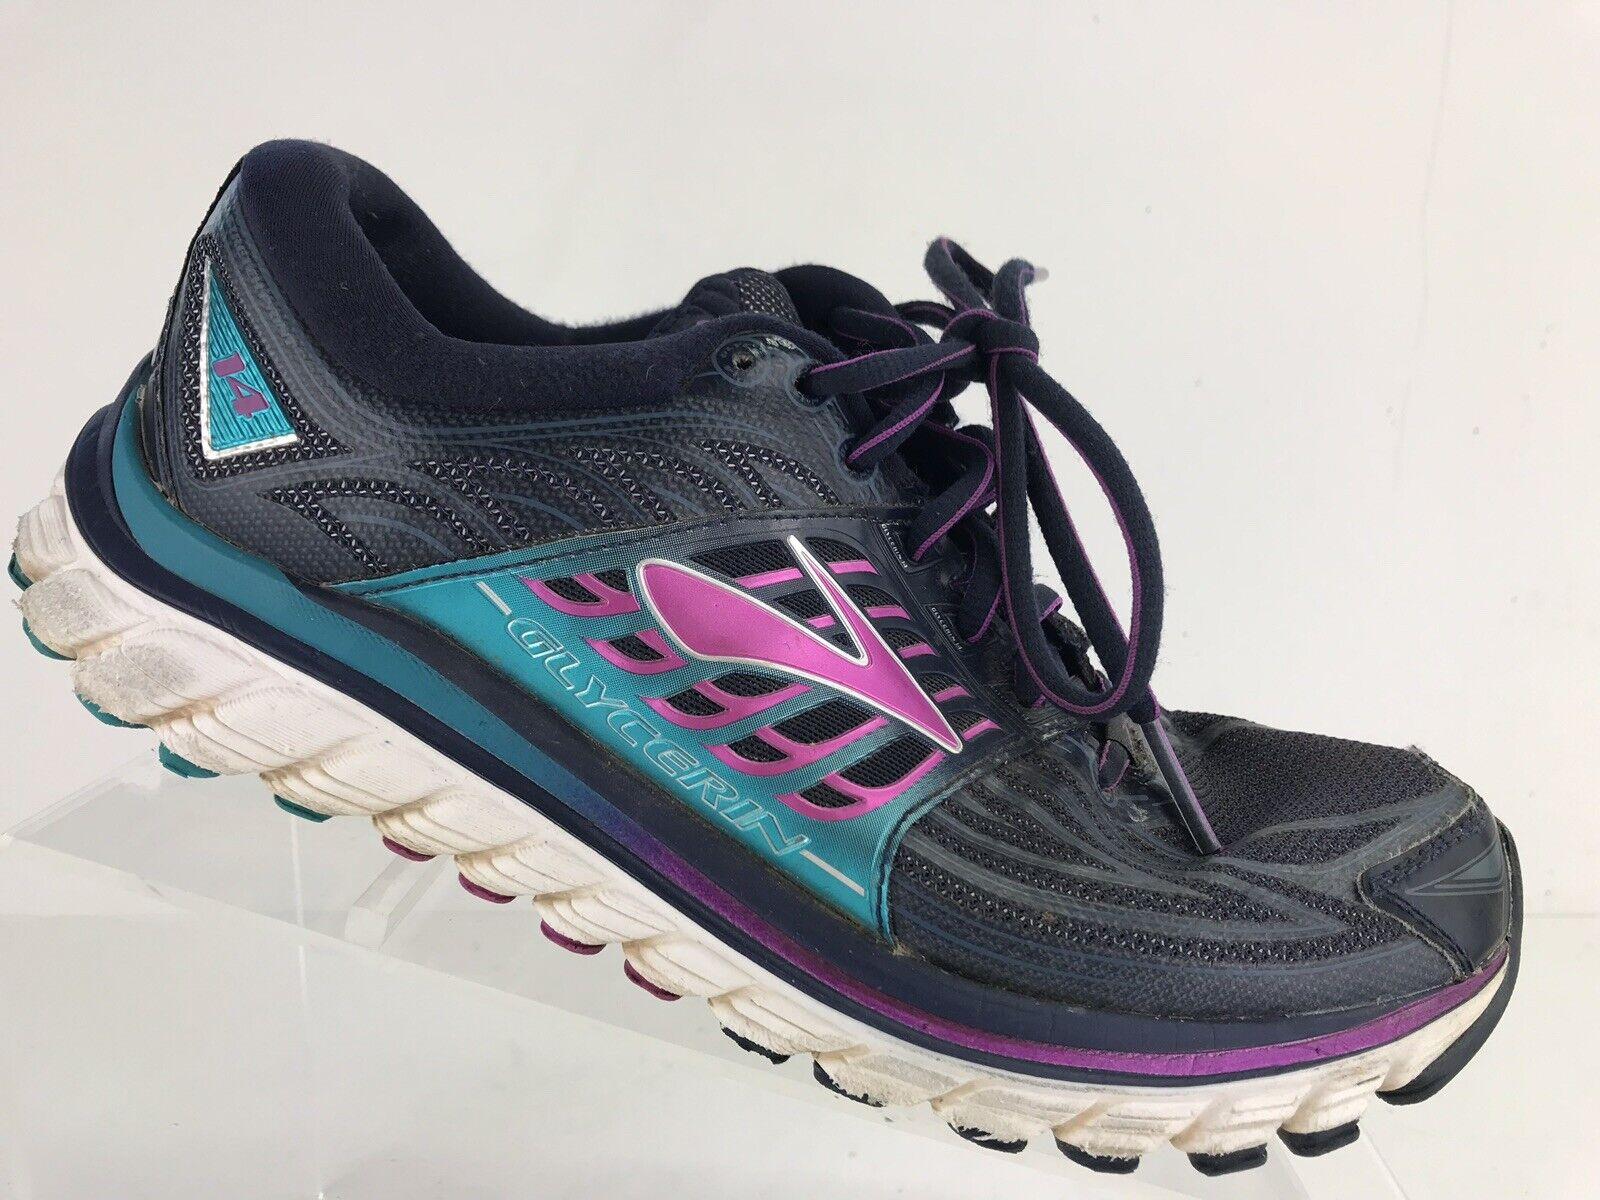 Brooks Glycerin 14 bluee Purple 1202171B413 Athletic Running shoes Women's 7.5 B